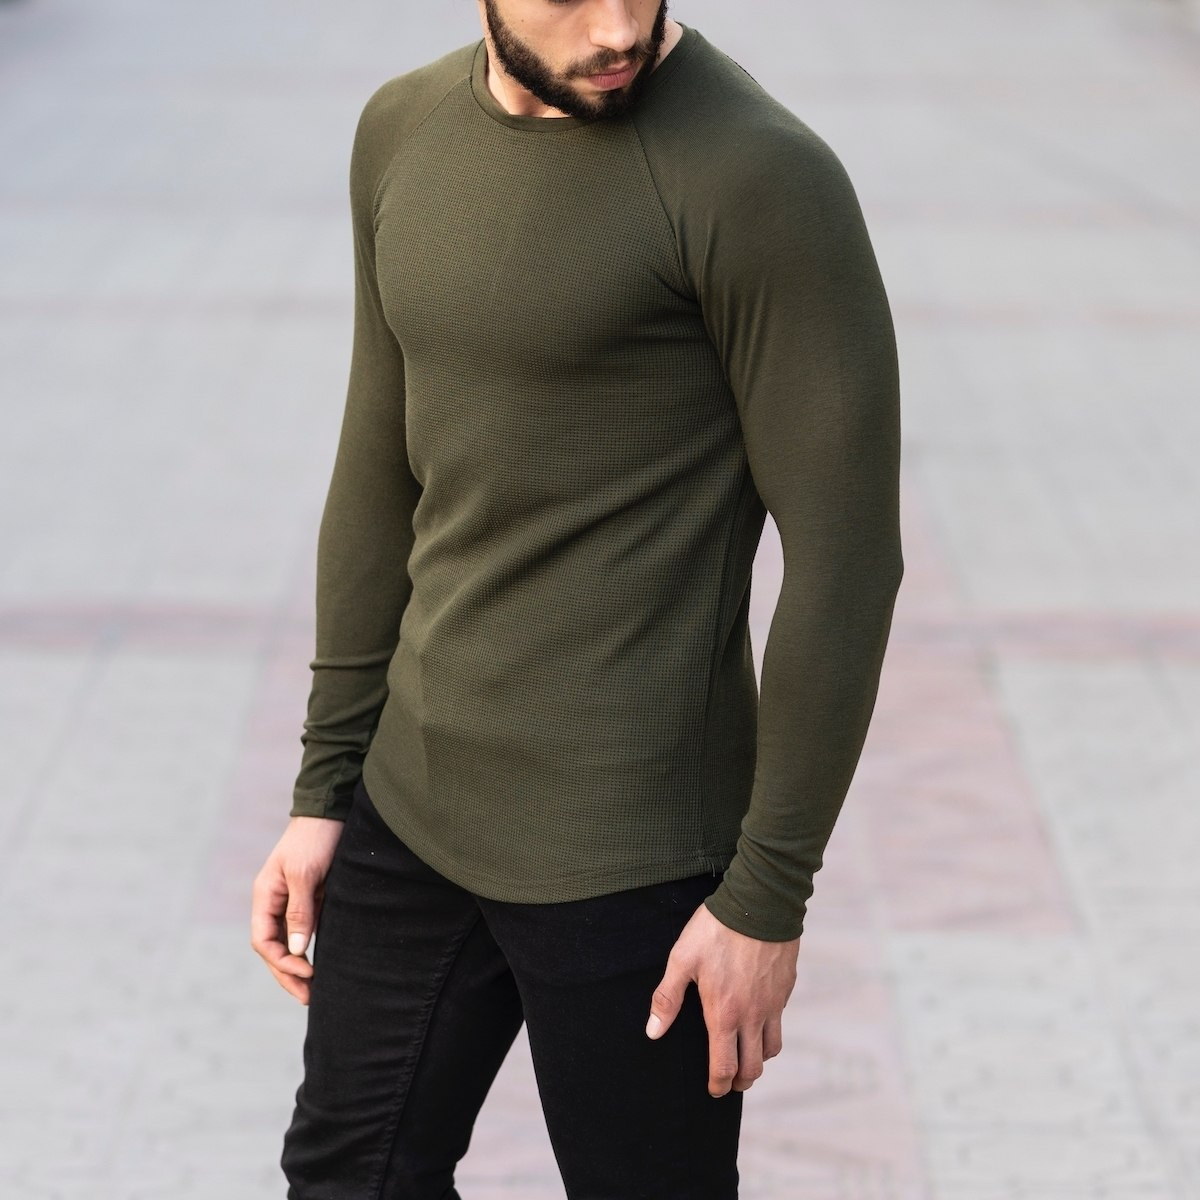 Dotwork Sweatshirt In Khahki Mv Premium Brand - 4